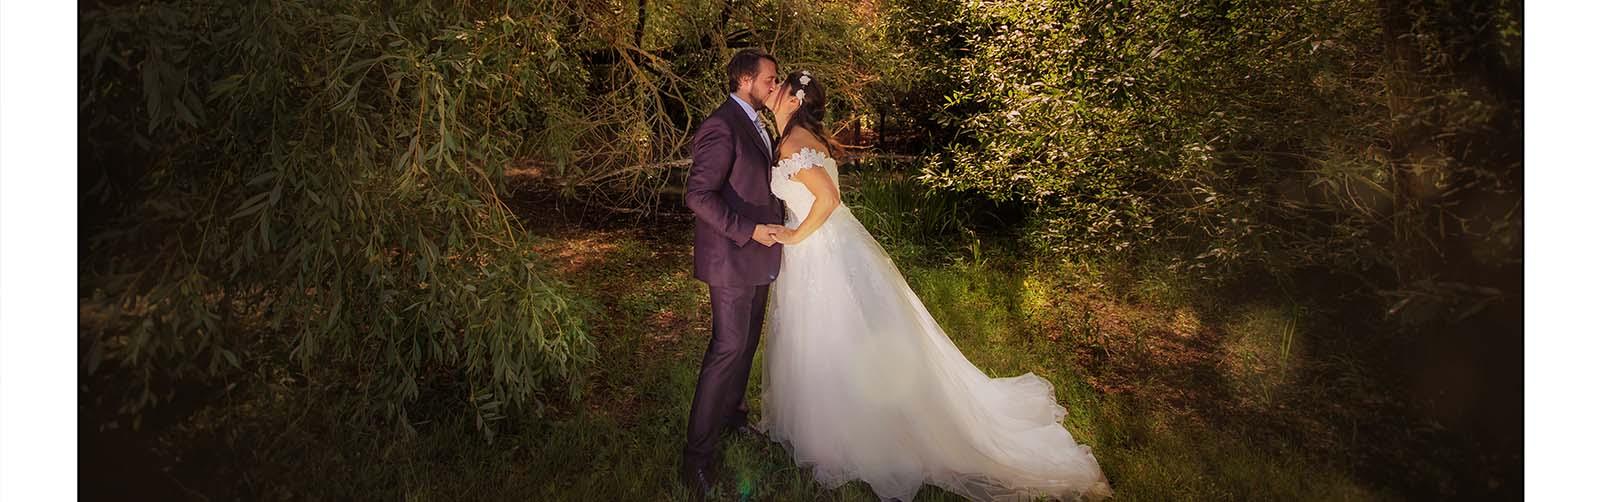 Ludovic Schuver, Le reportage photo du mariage